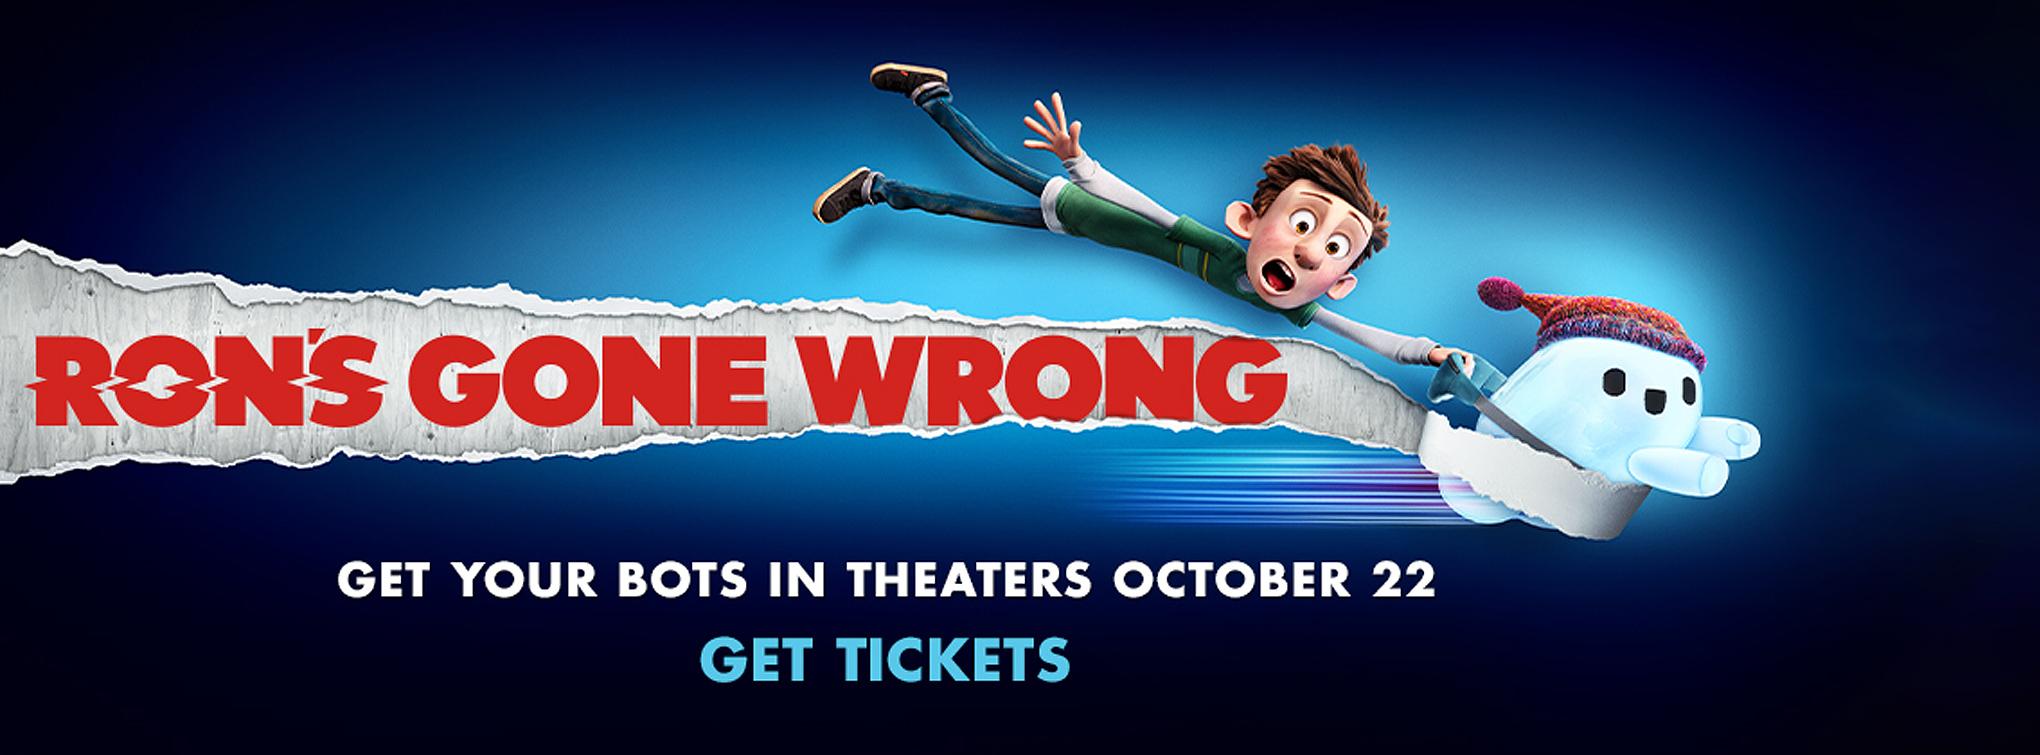 Slider image for Ron's Gone Wrong